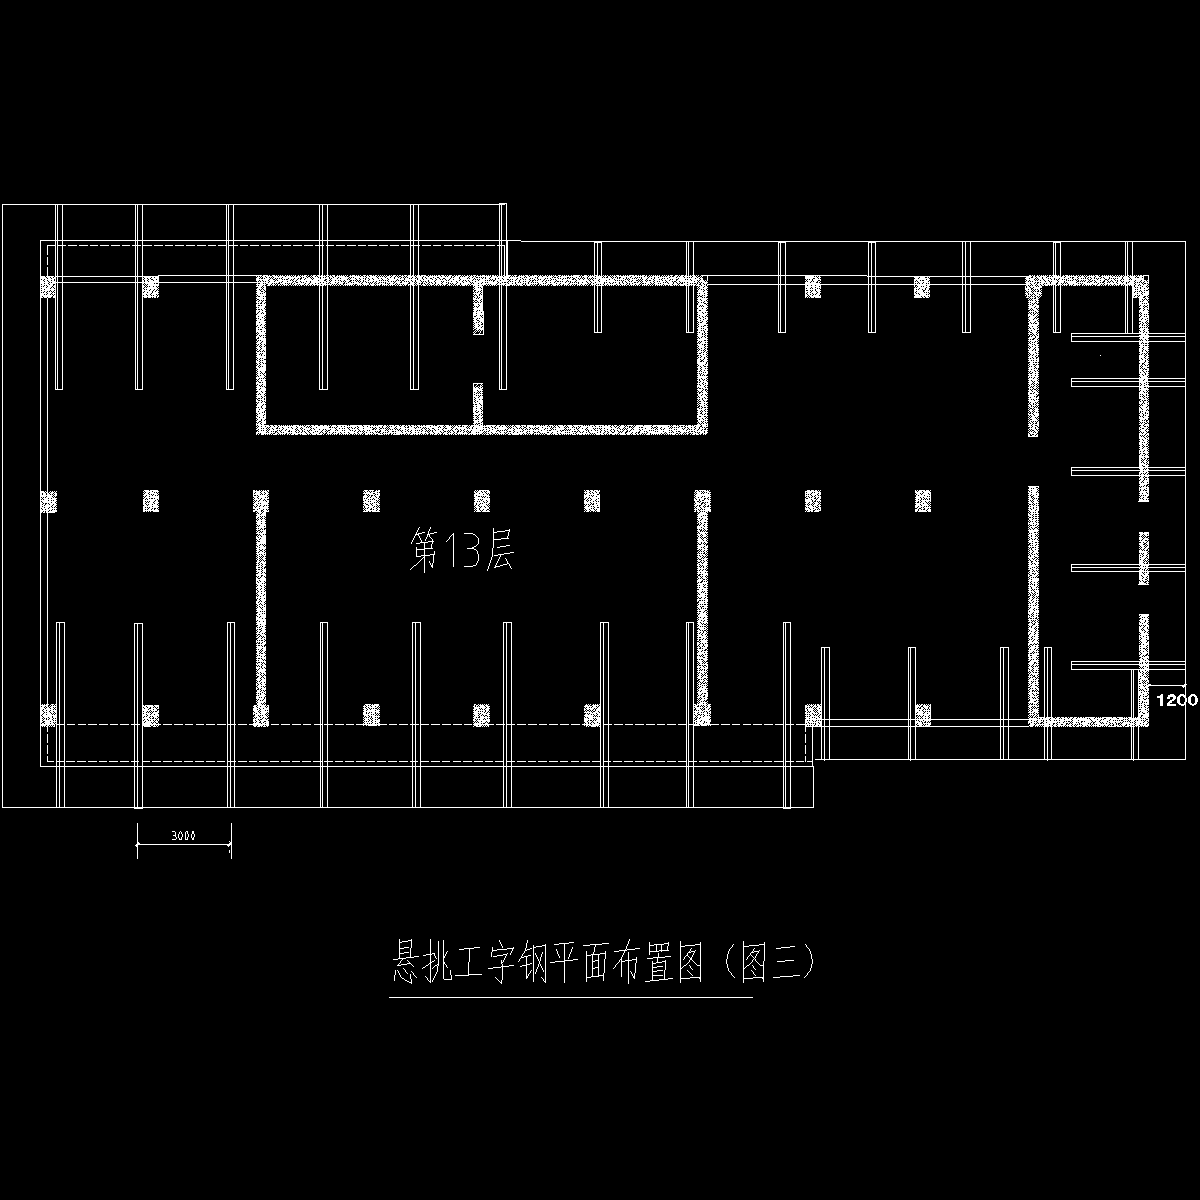 drawing外架平面图(三)2009-7-23.dwg